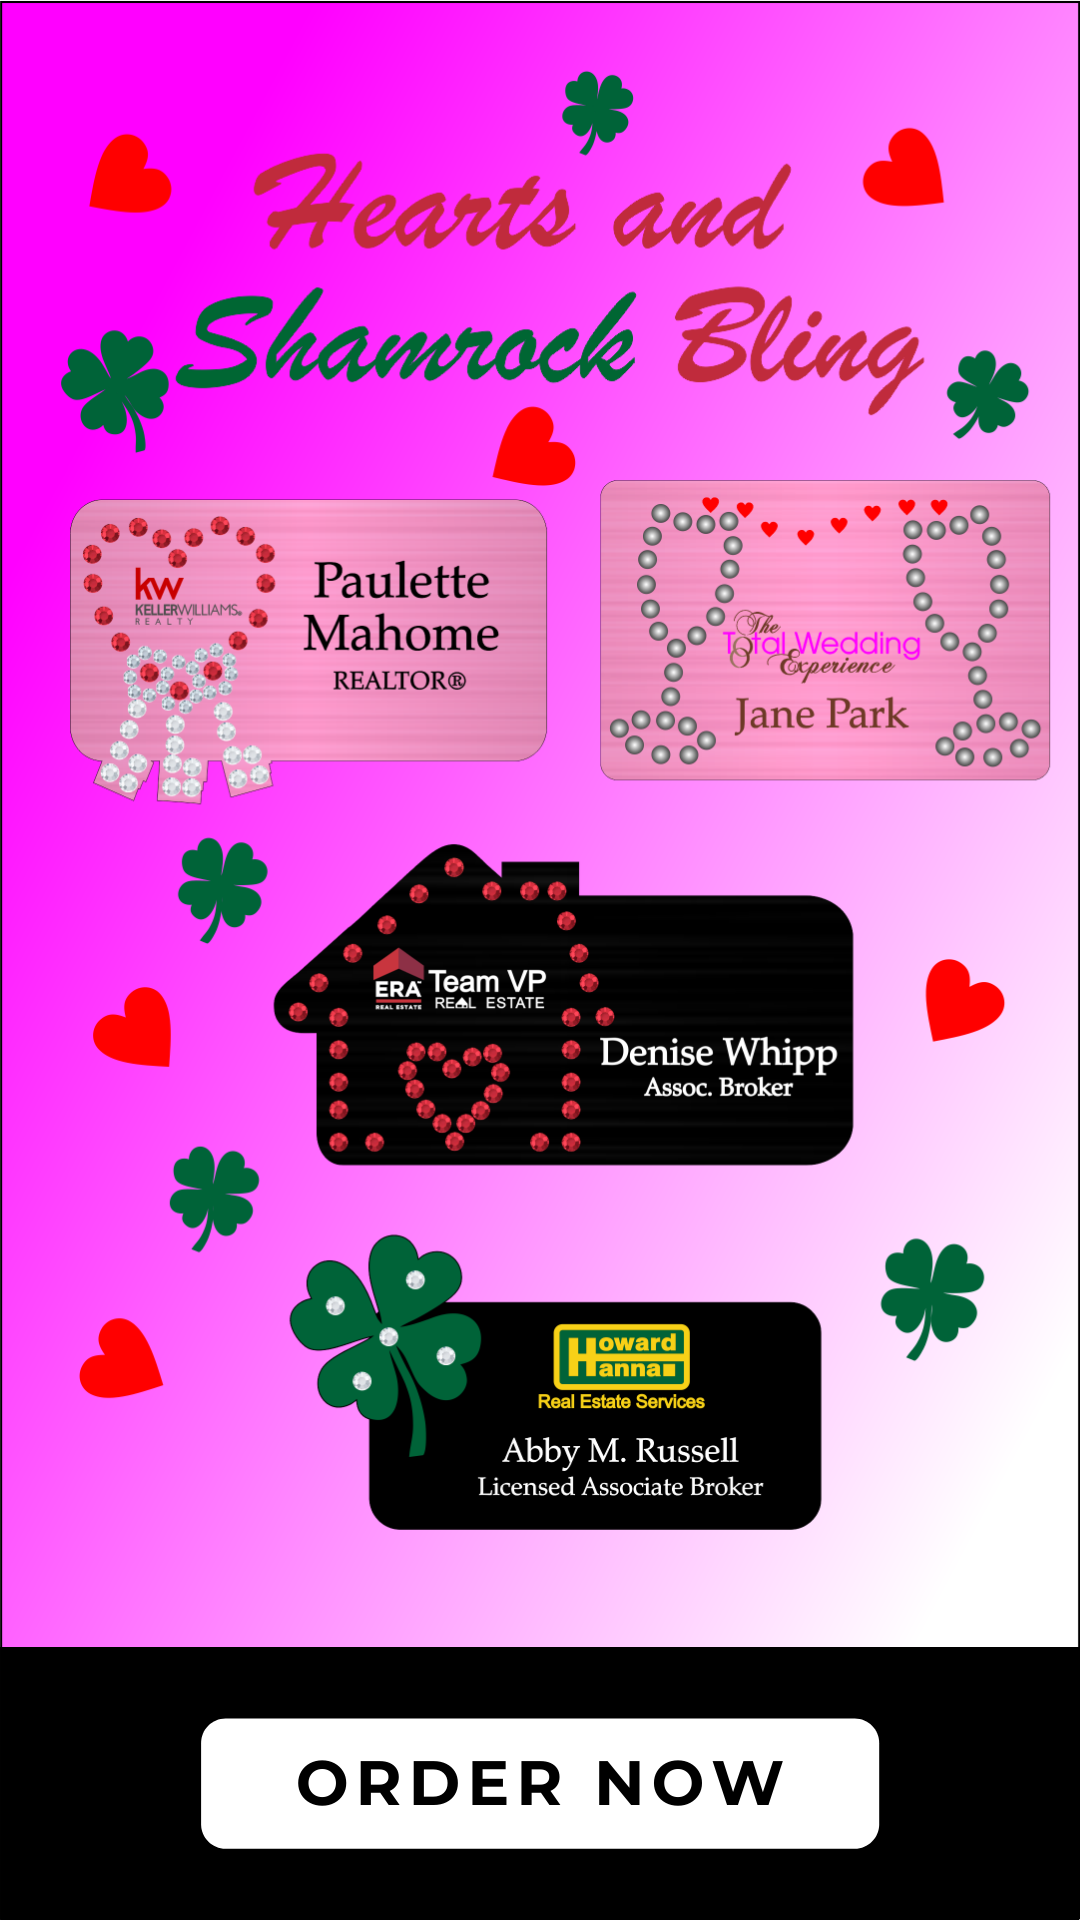 valentine and shamrock